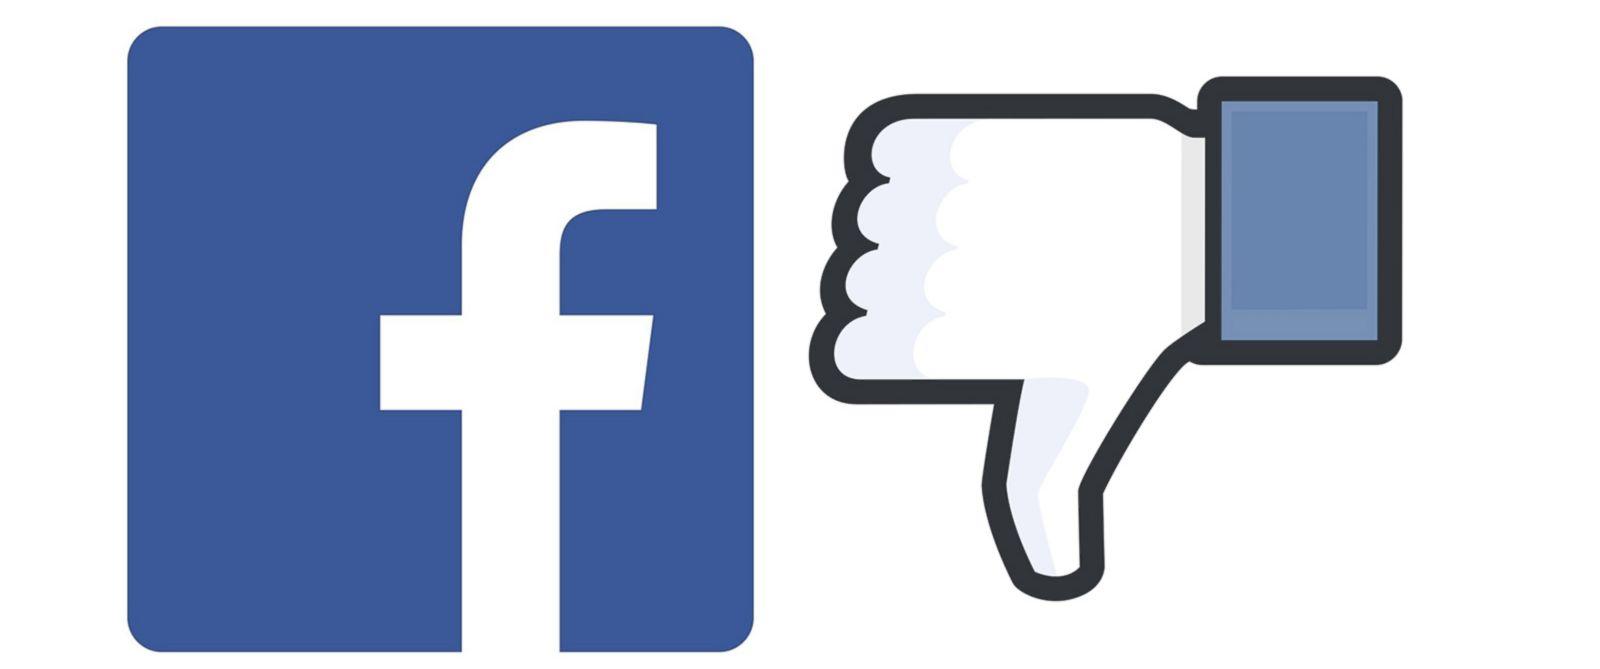 Facebook logo dislike łapka w dół